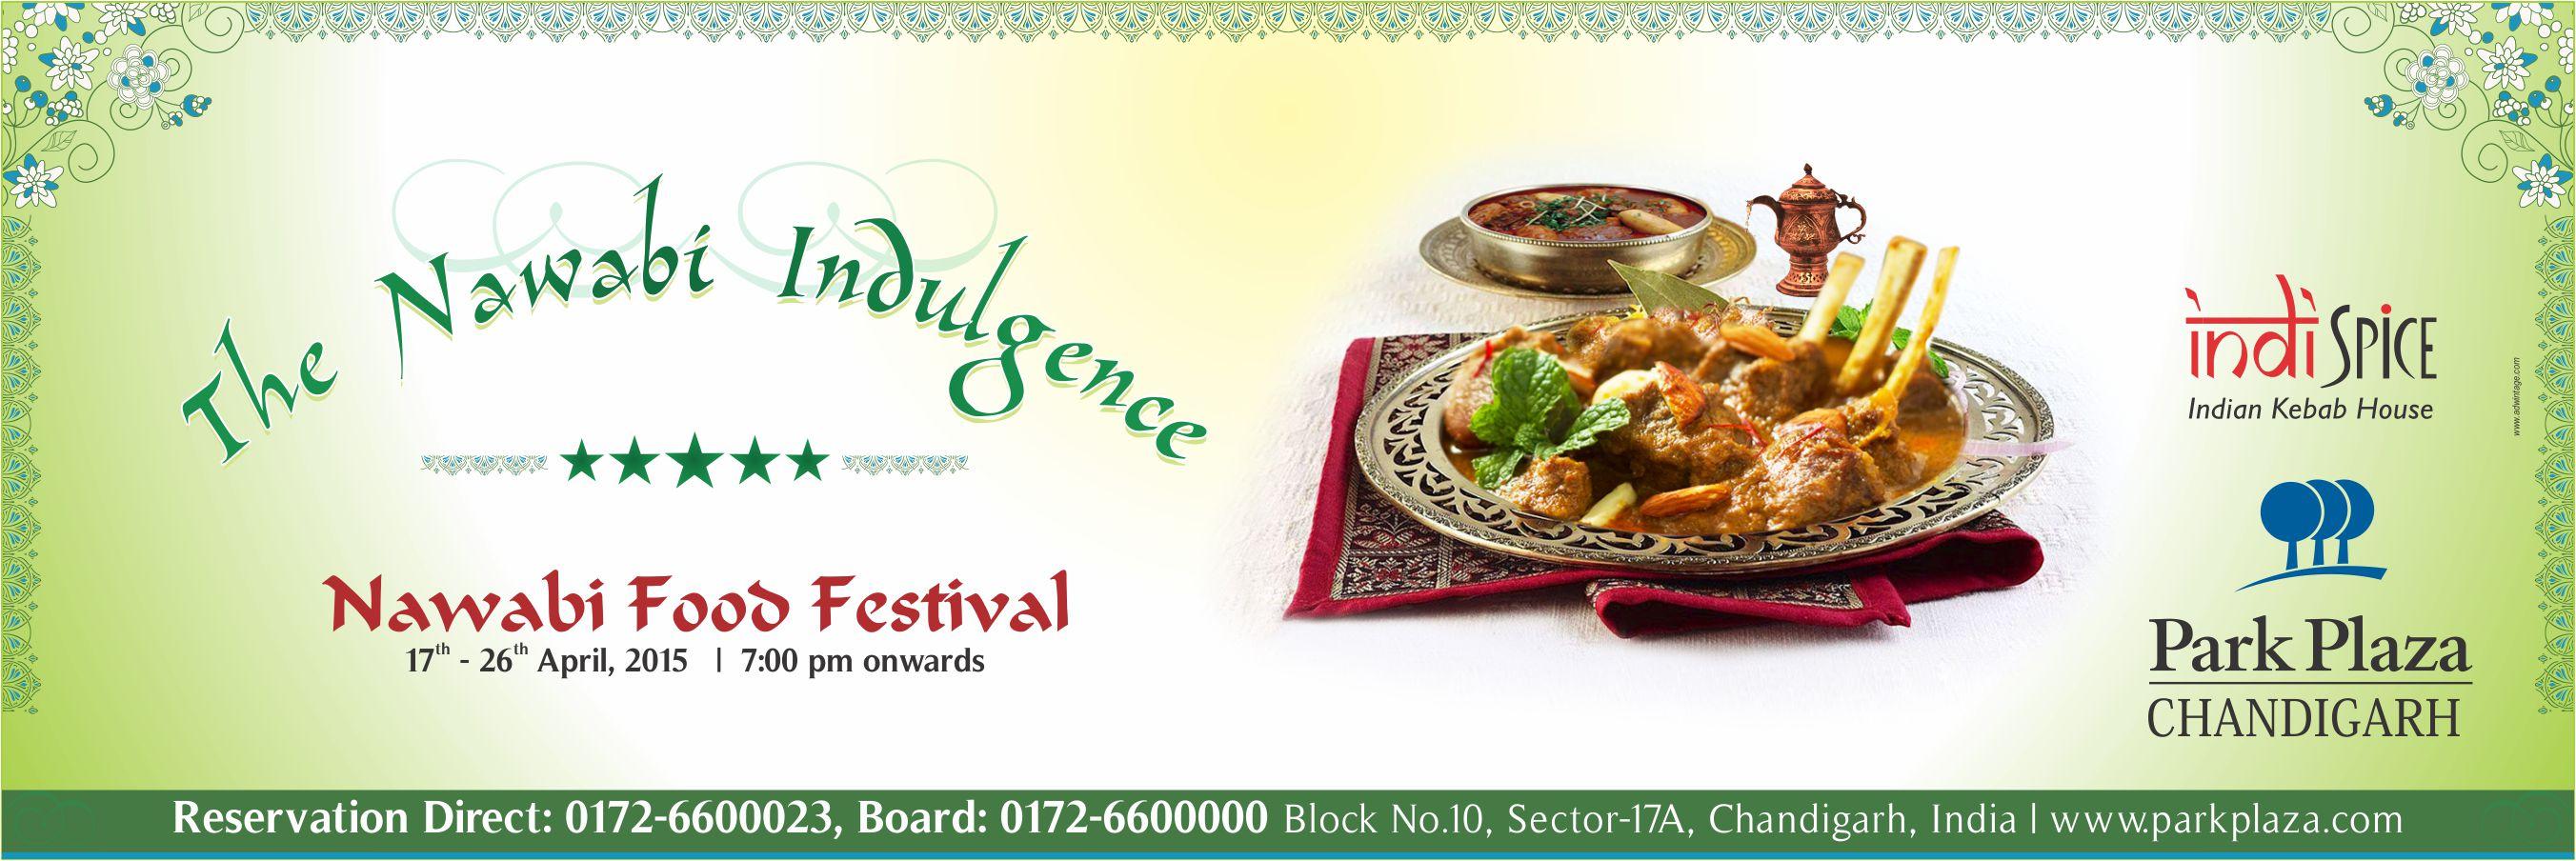 Nawabi Food Festival: Nawabi Tadka